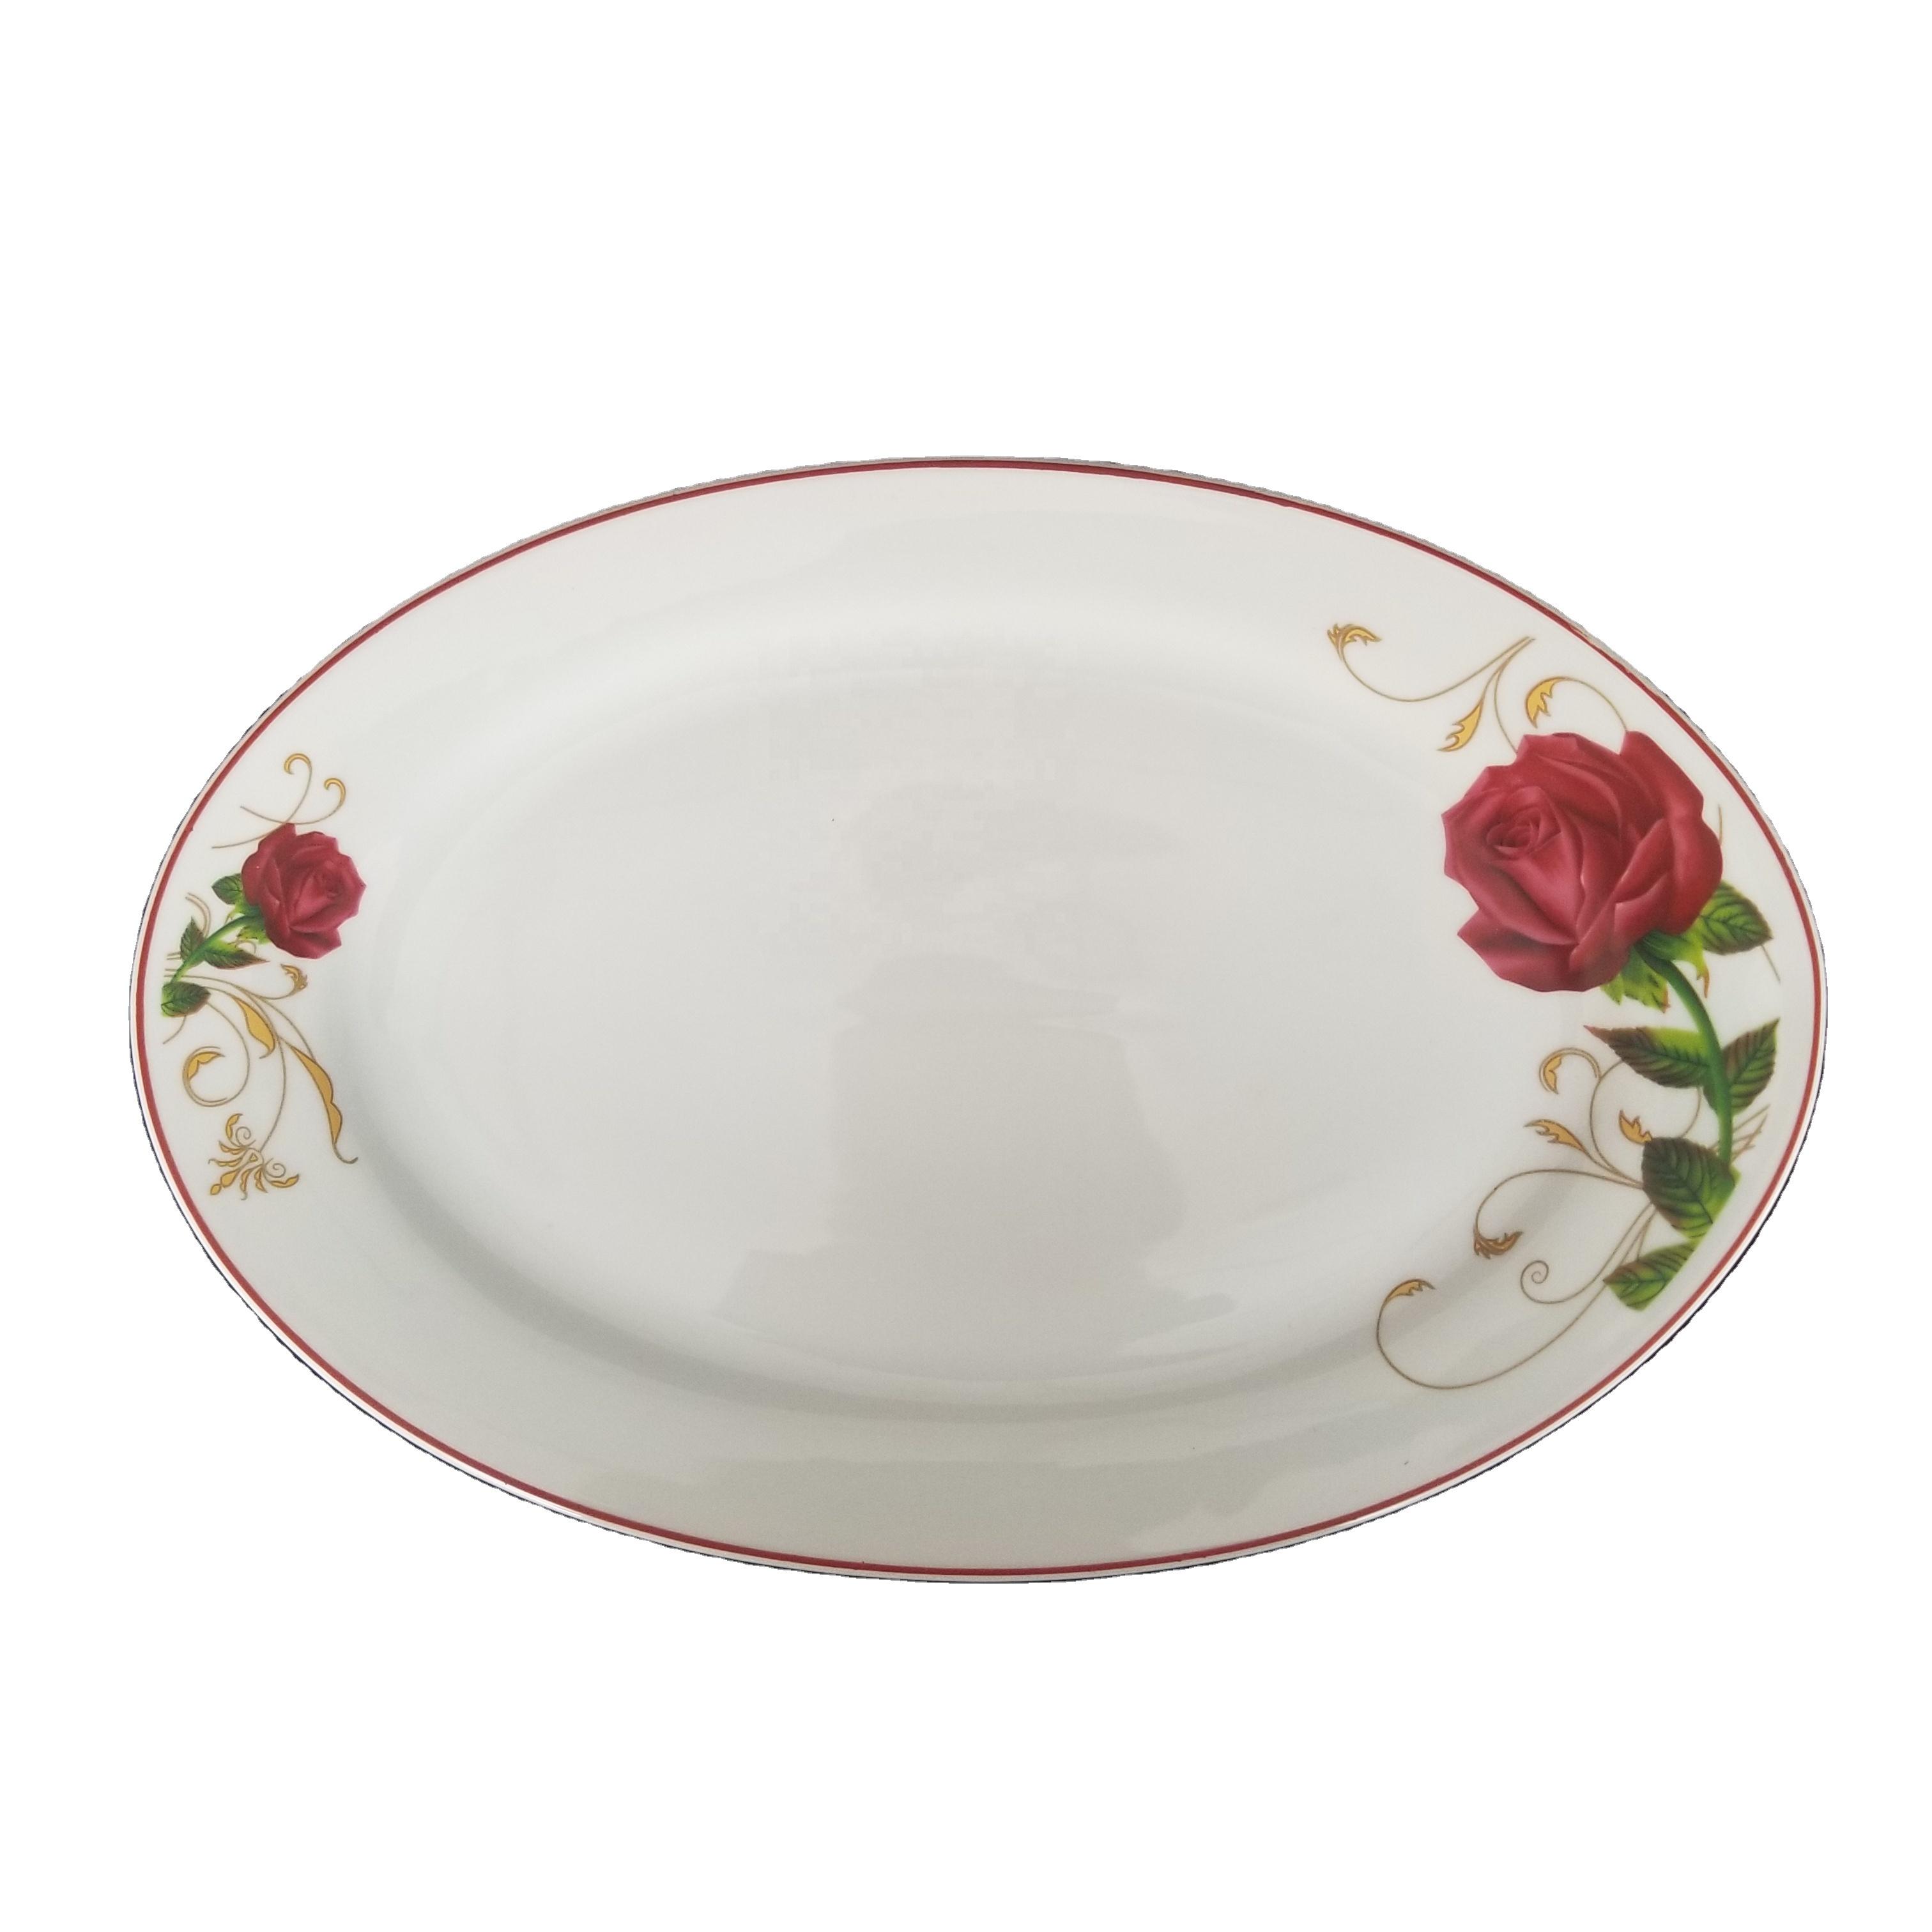 stocked Oval shape ceramic plate plain white